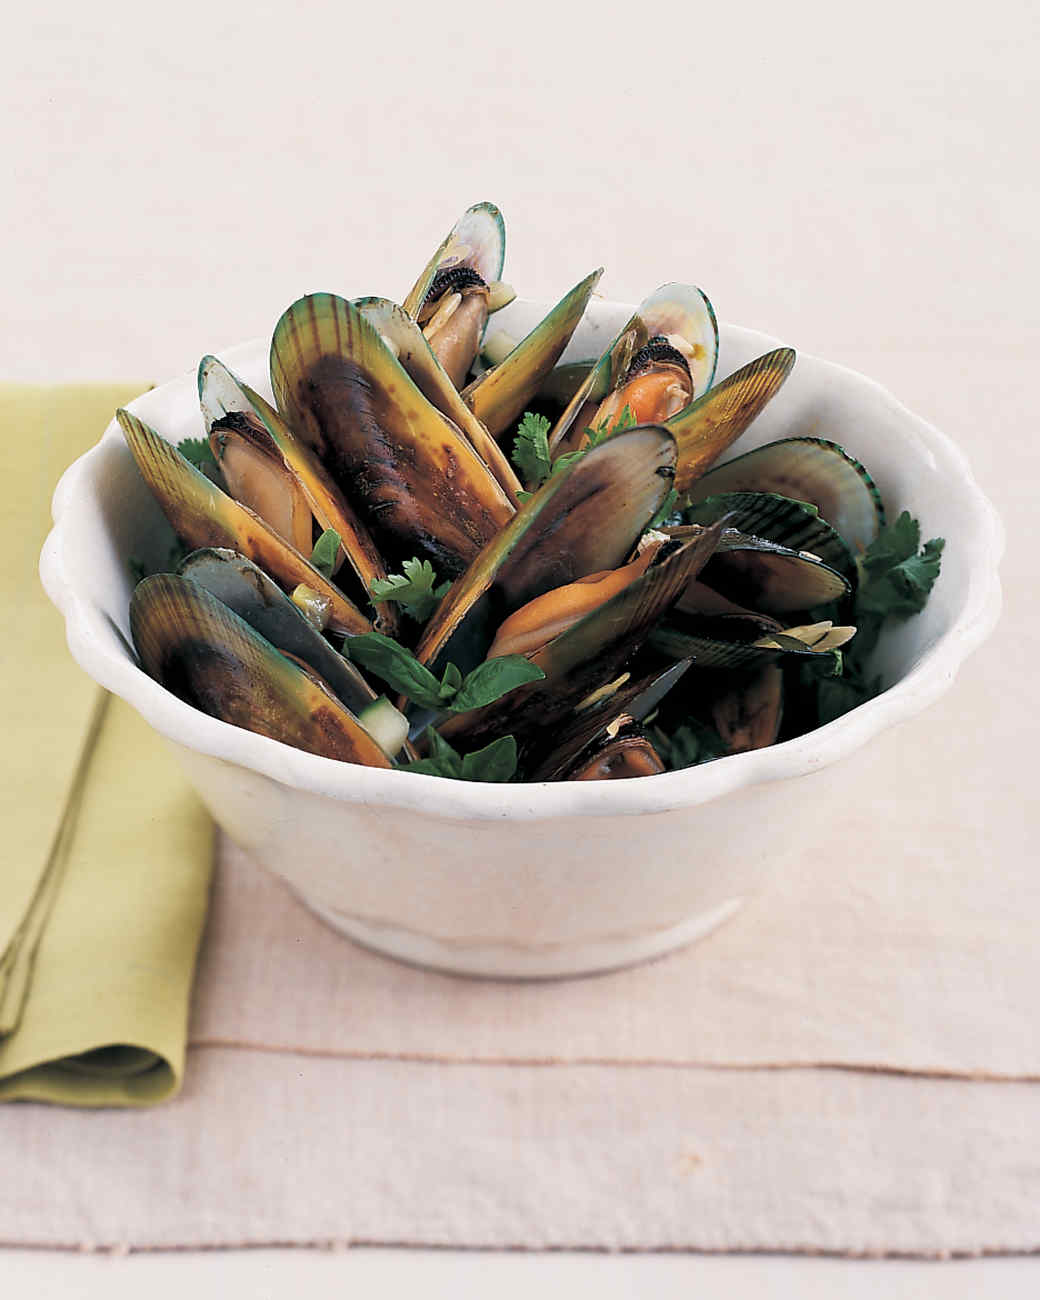 a98268_0900_mussels.jpg